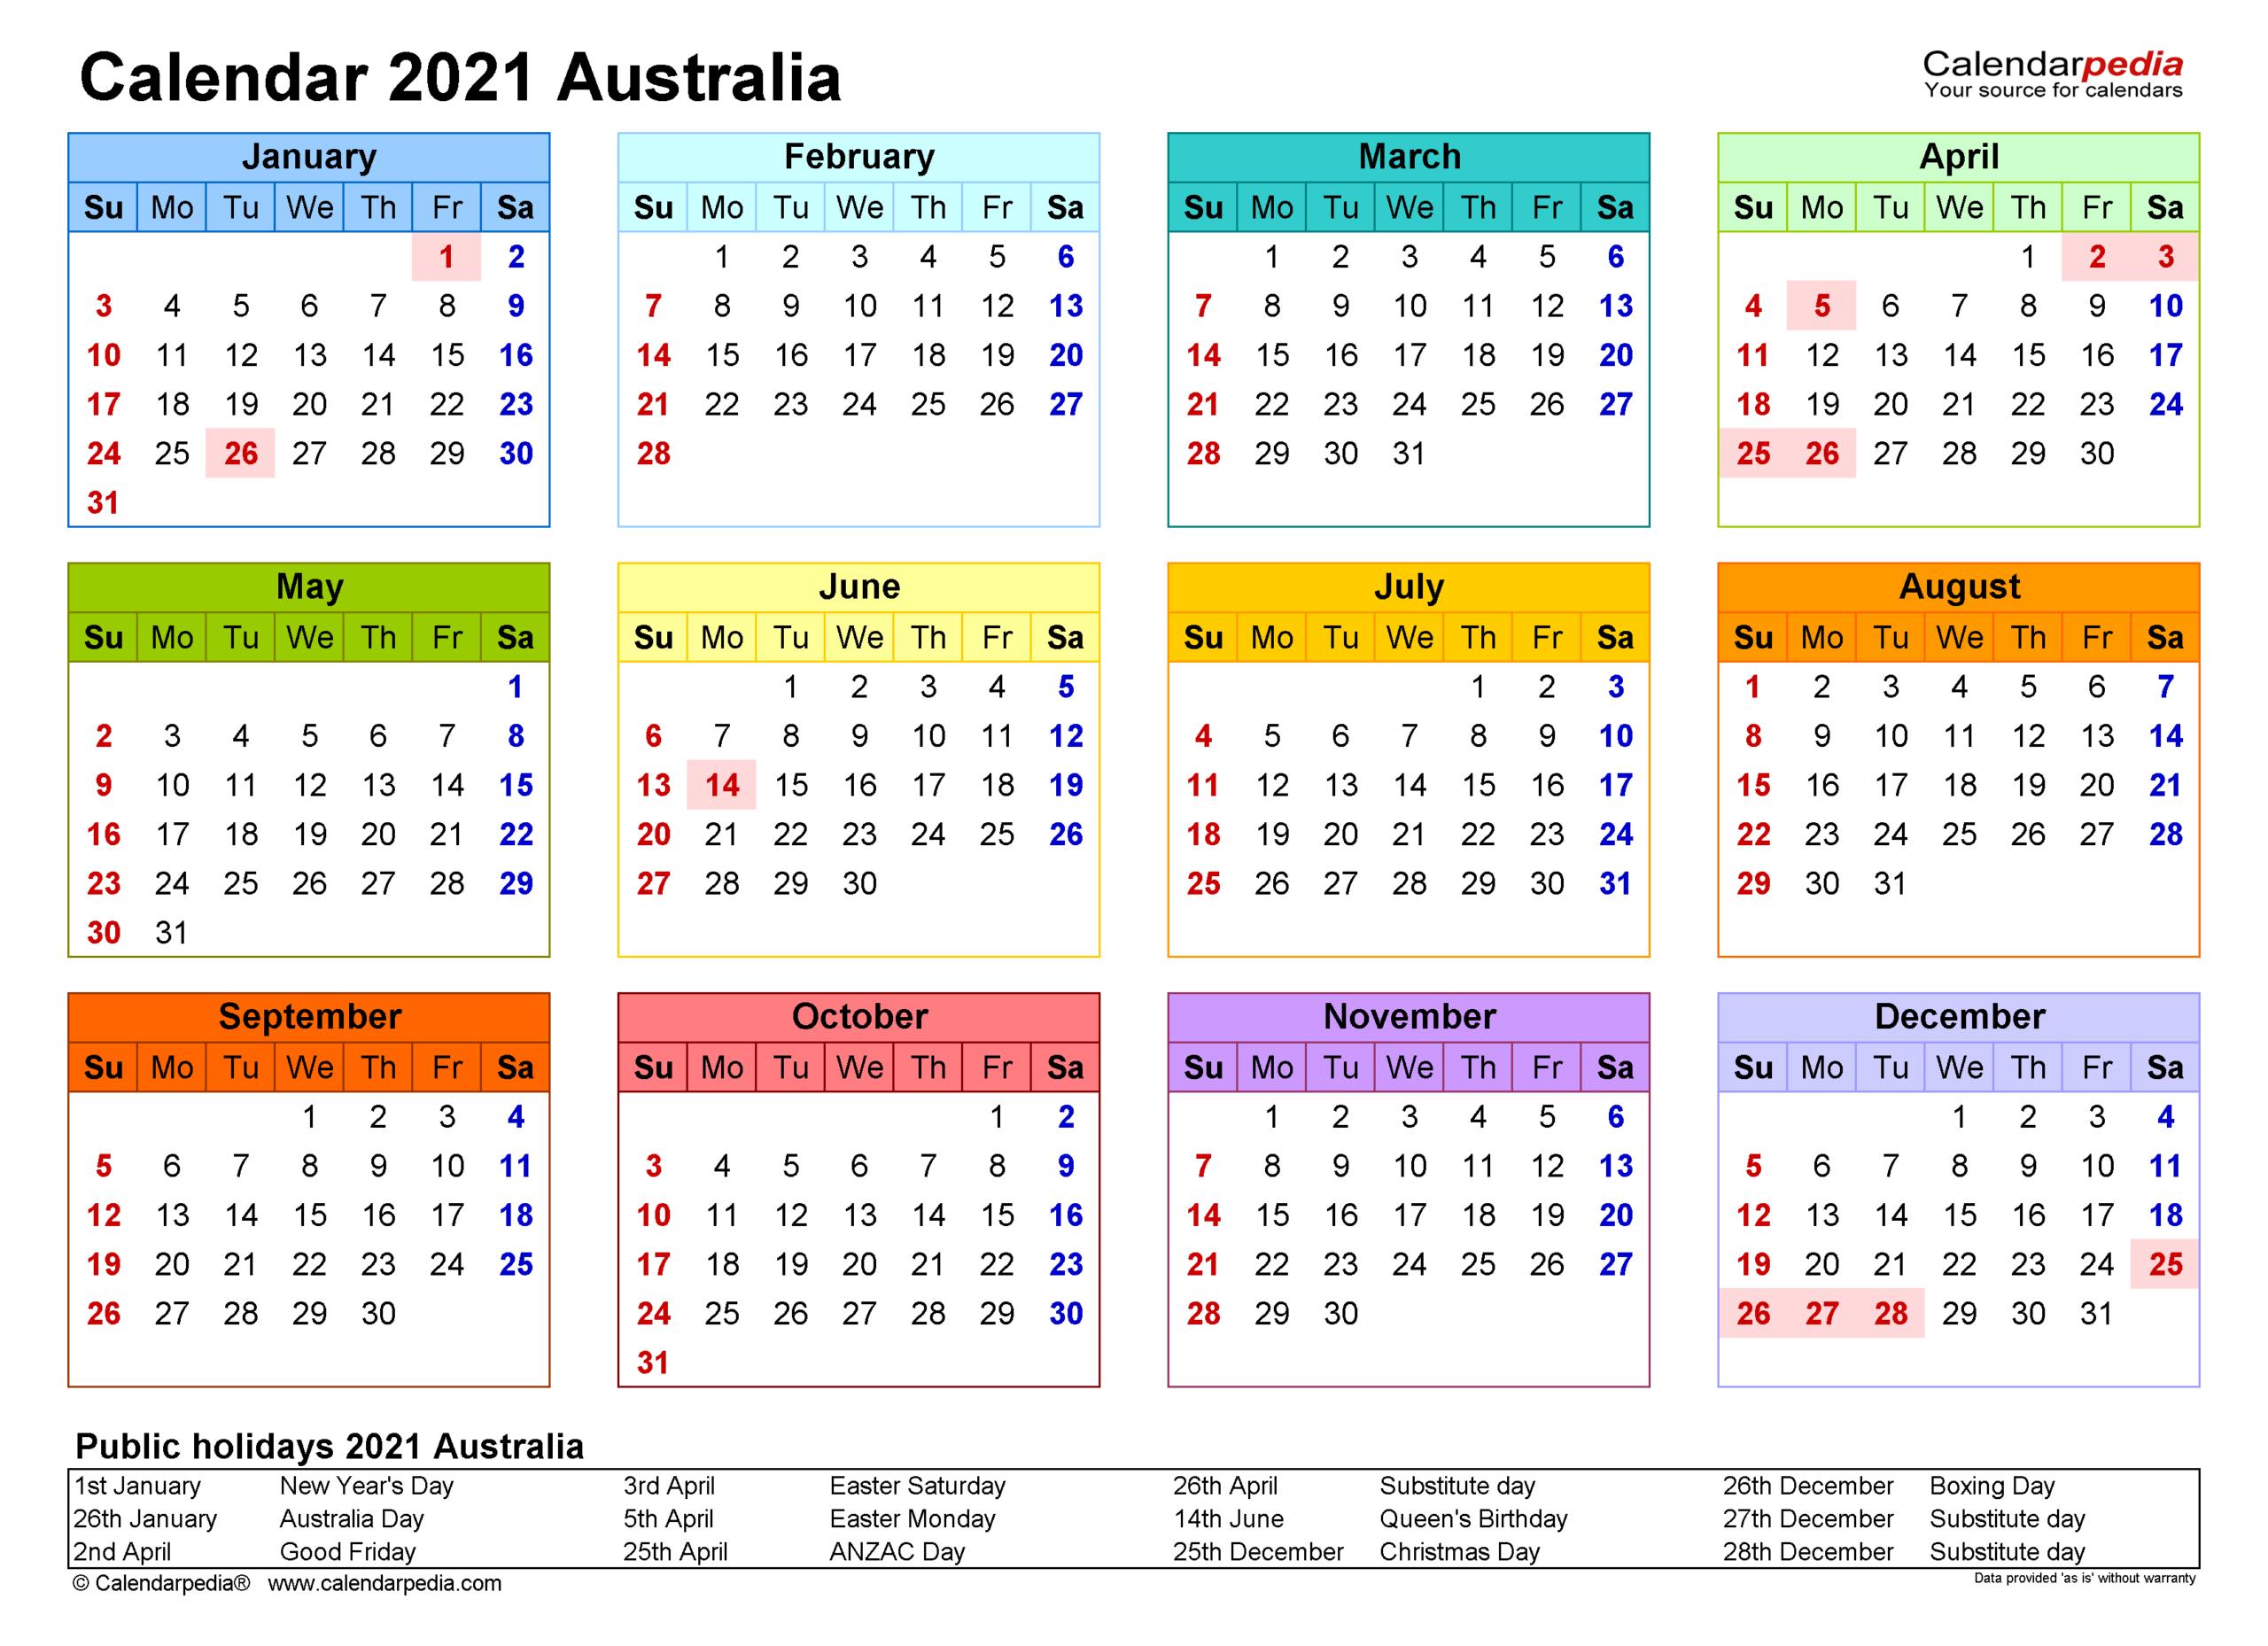 Australia Calendar 2021 - Free Printable Word Templates regarding Calendar Fill In 2021